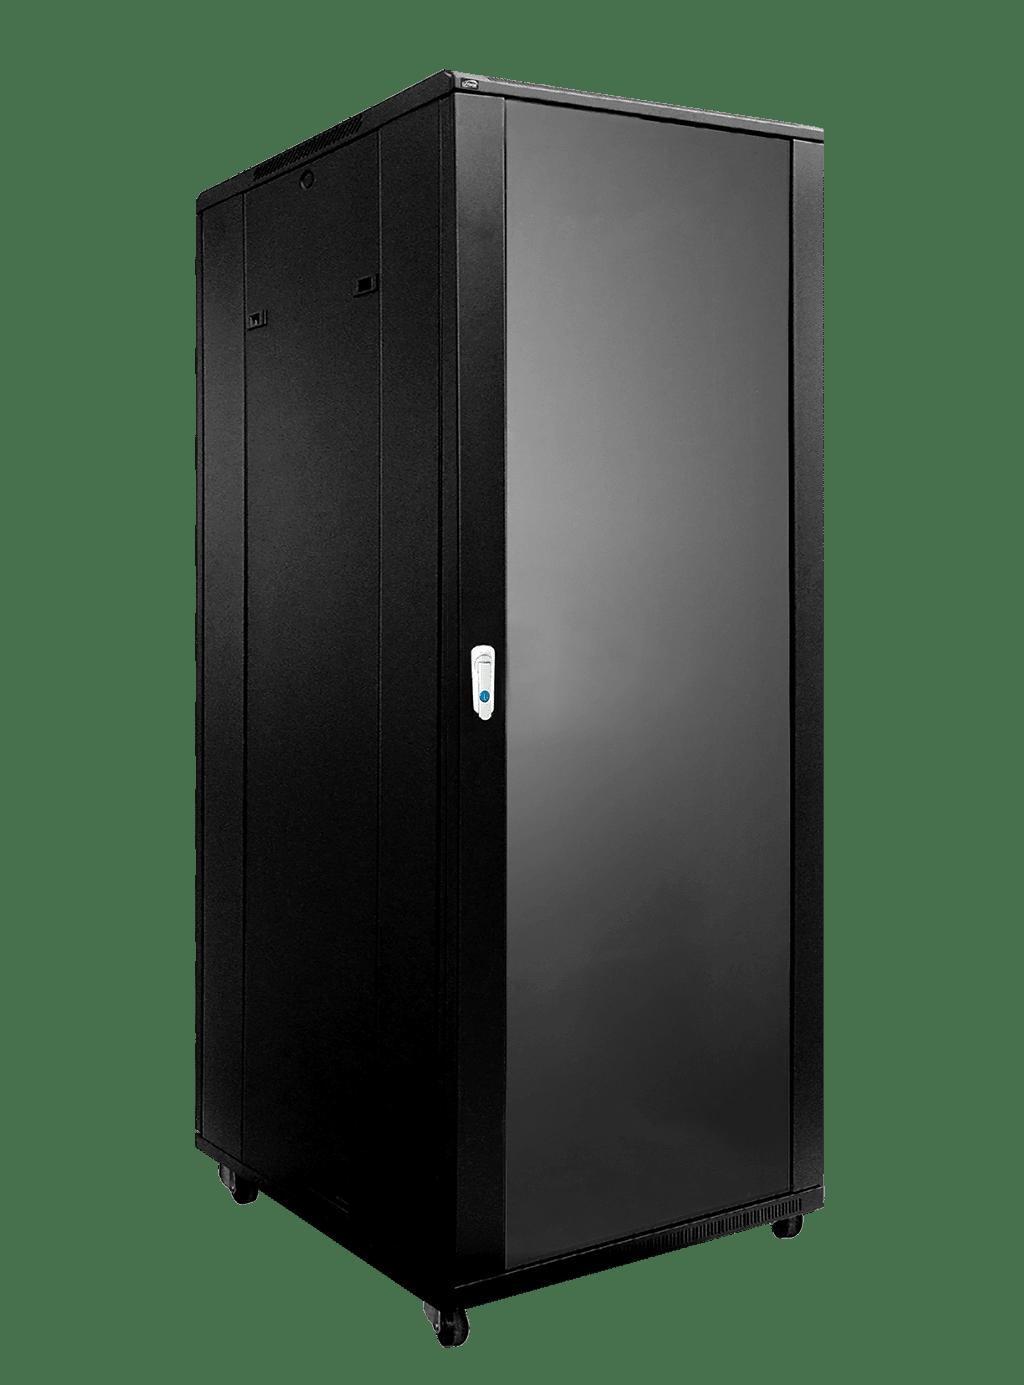 "SPR832 - 19"" rack cabinet - 32 units - 800mm depth"